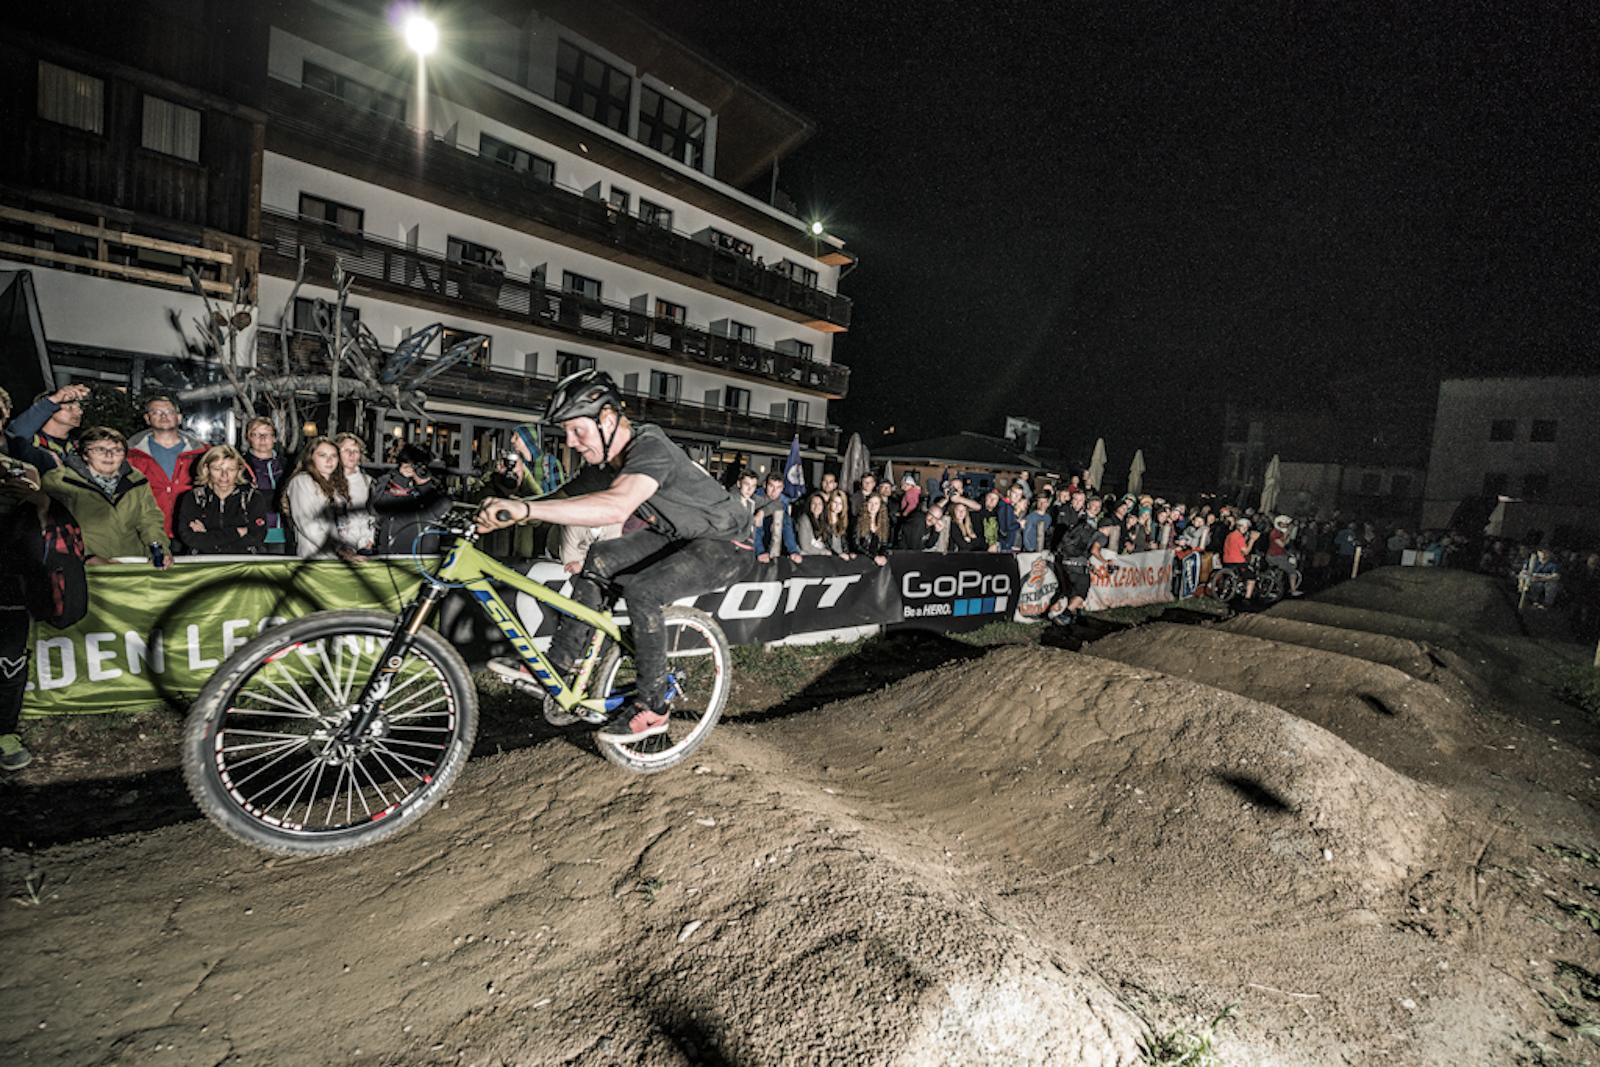 Pumptrack-Race by Bartek Wolinski